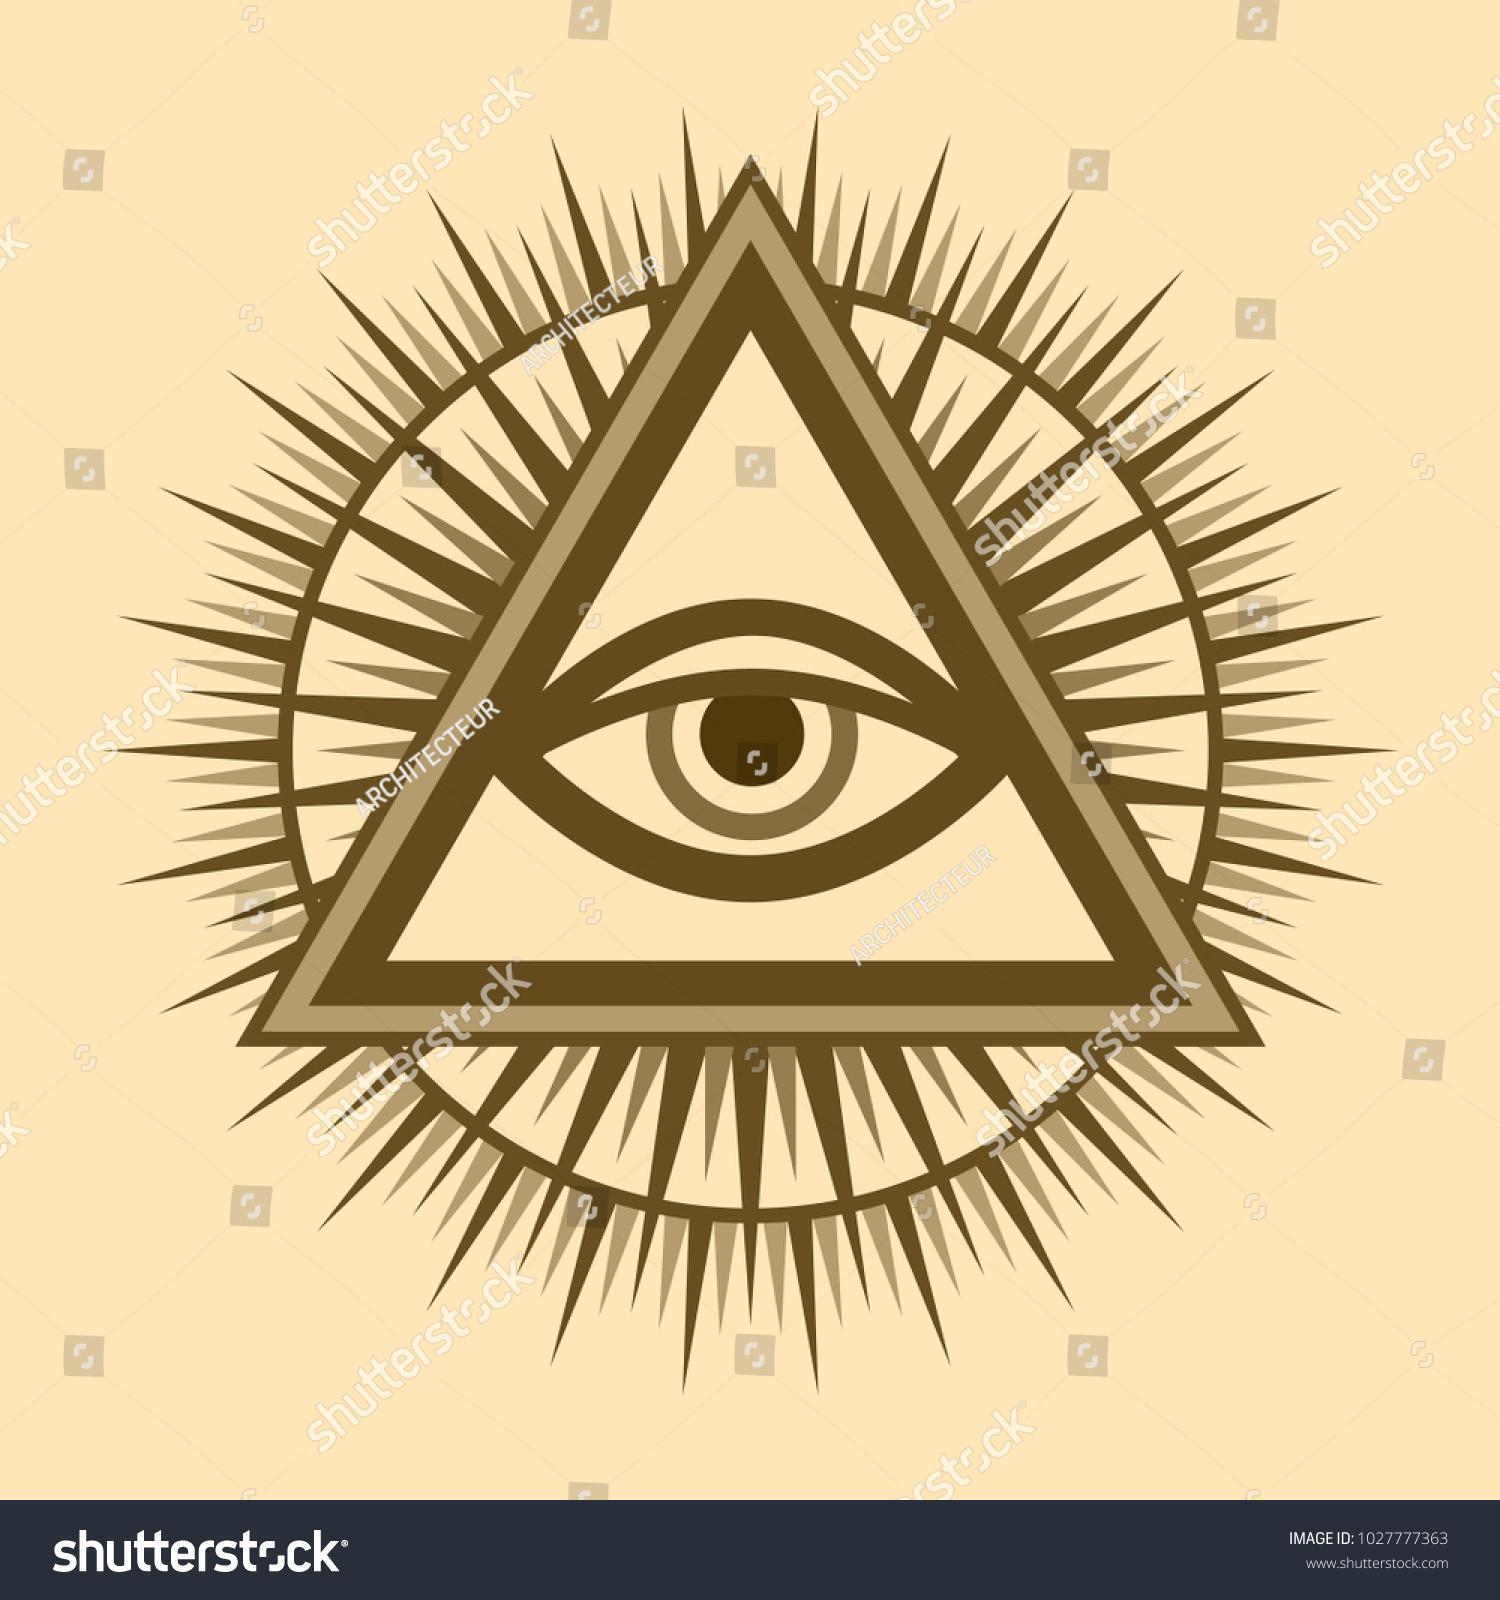 Allseeing eye god the eye providence stock vector 1027777363 all seeing eye of god the eye of providence eye of omniscience biocorpaavc